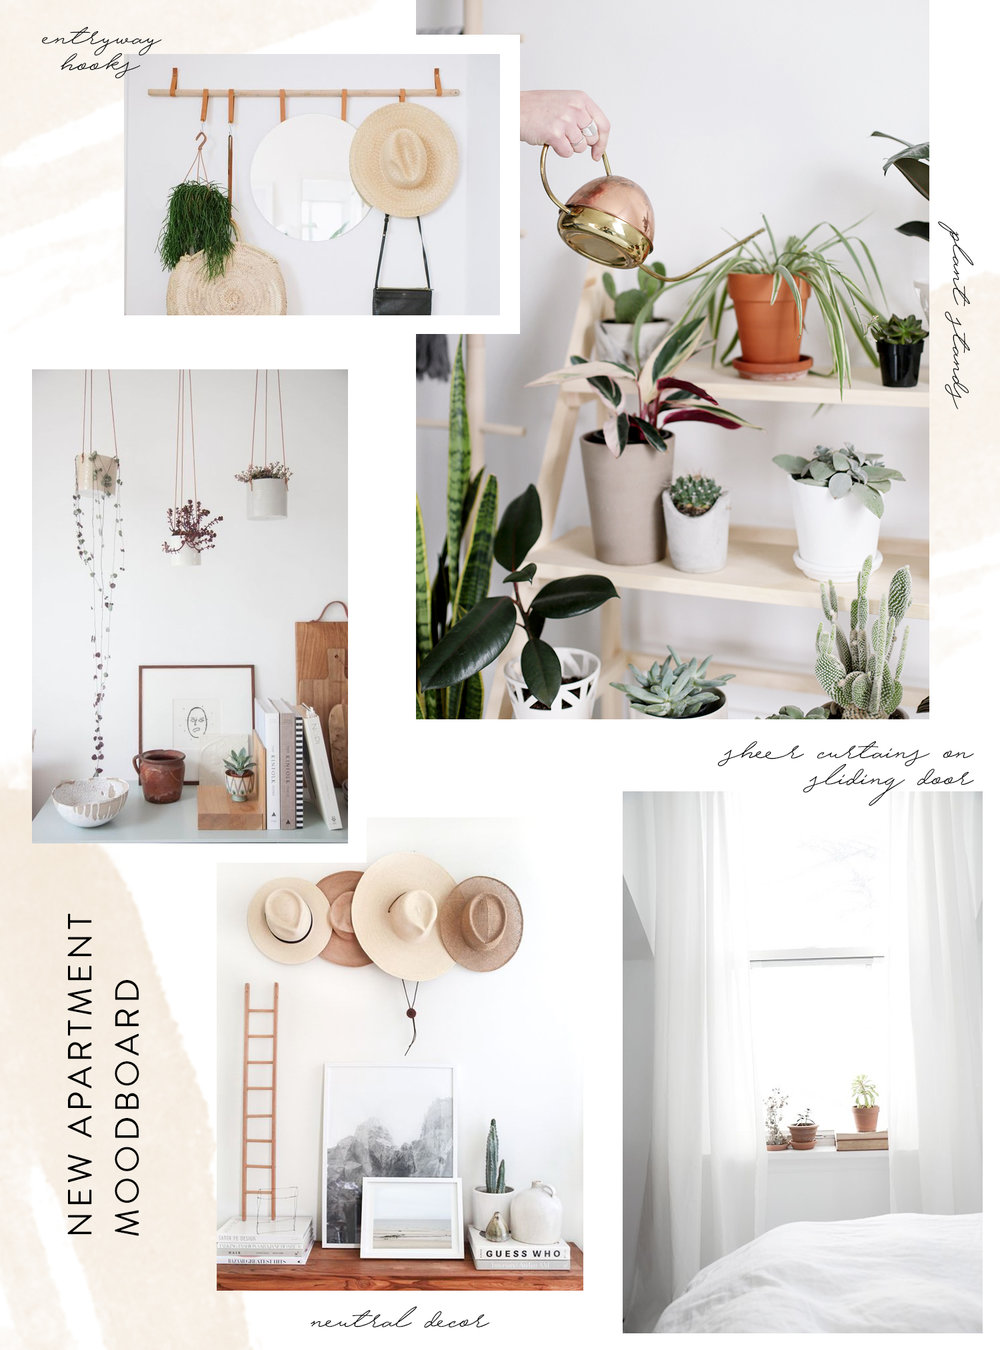 boho, neutral apartment decor moodboard | Reux Design Co.